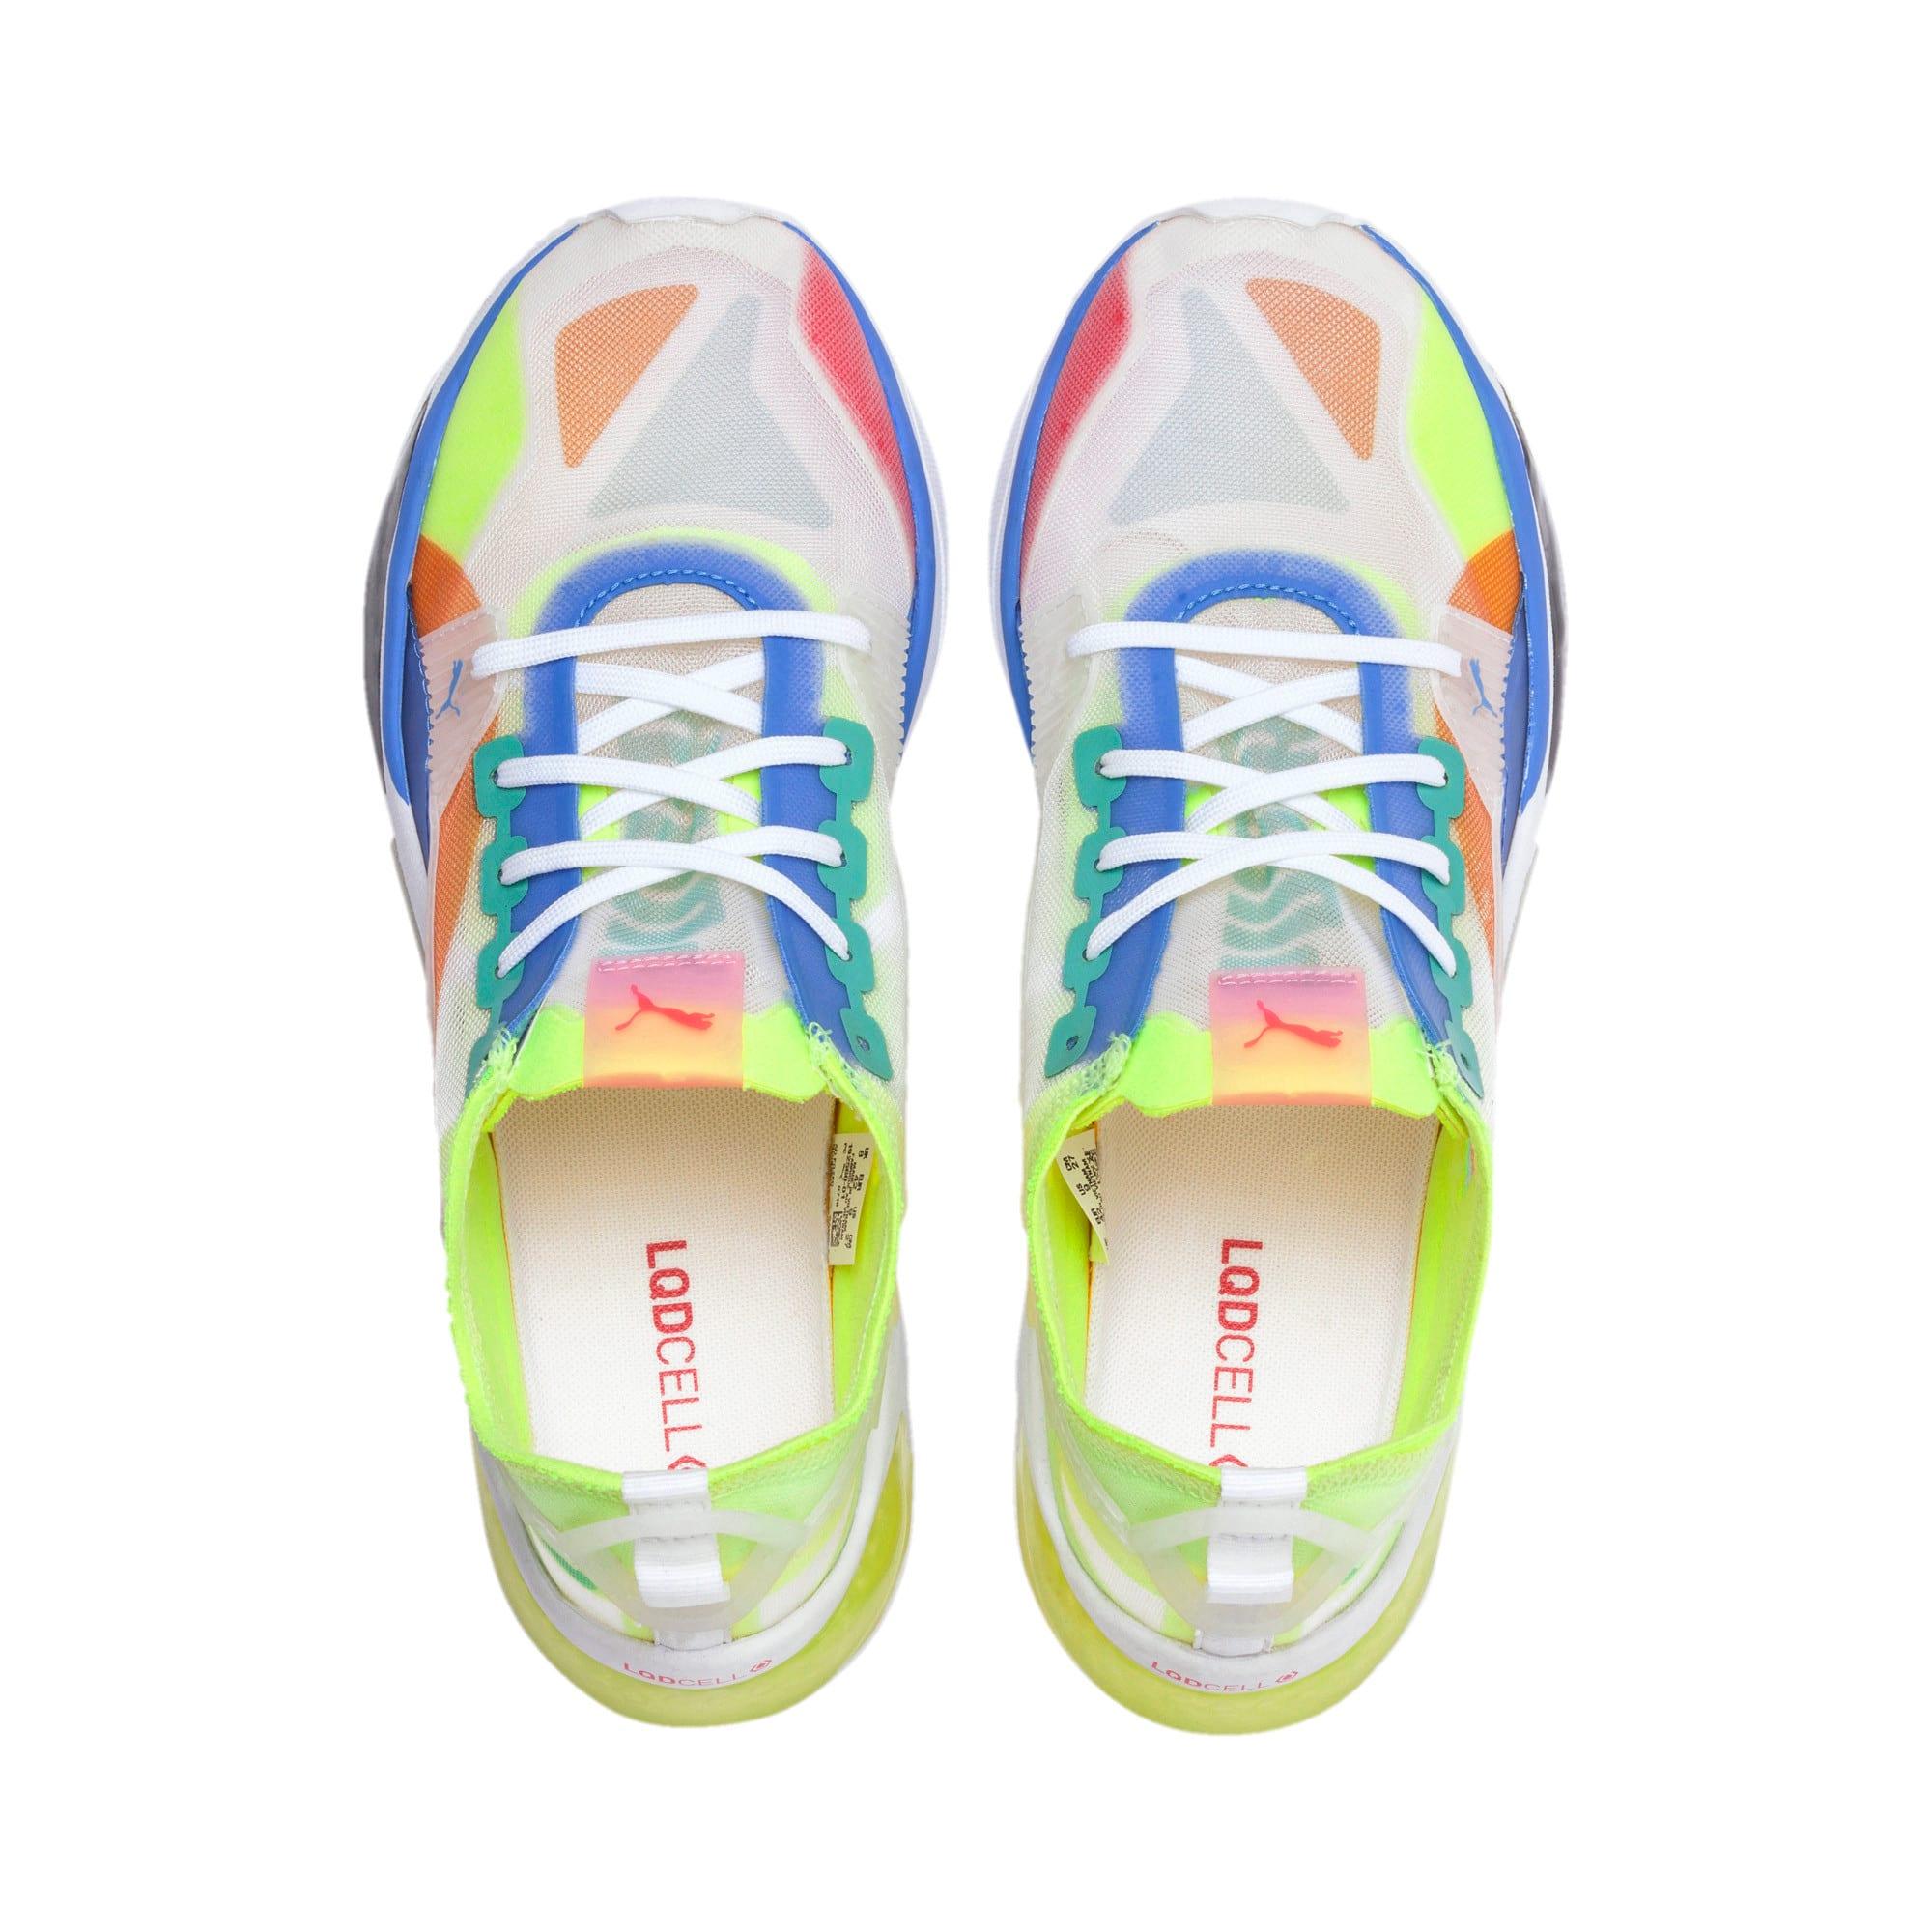 Thumbnail 6 of LQDCELL Optic Sheer Women's Training Shoes, Puma White, medium